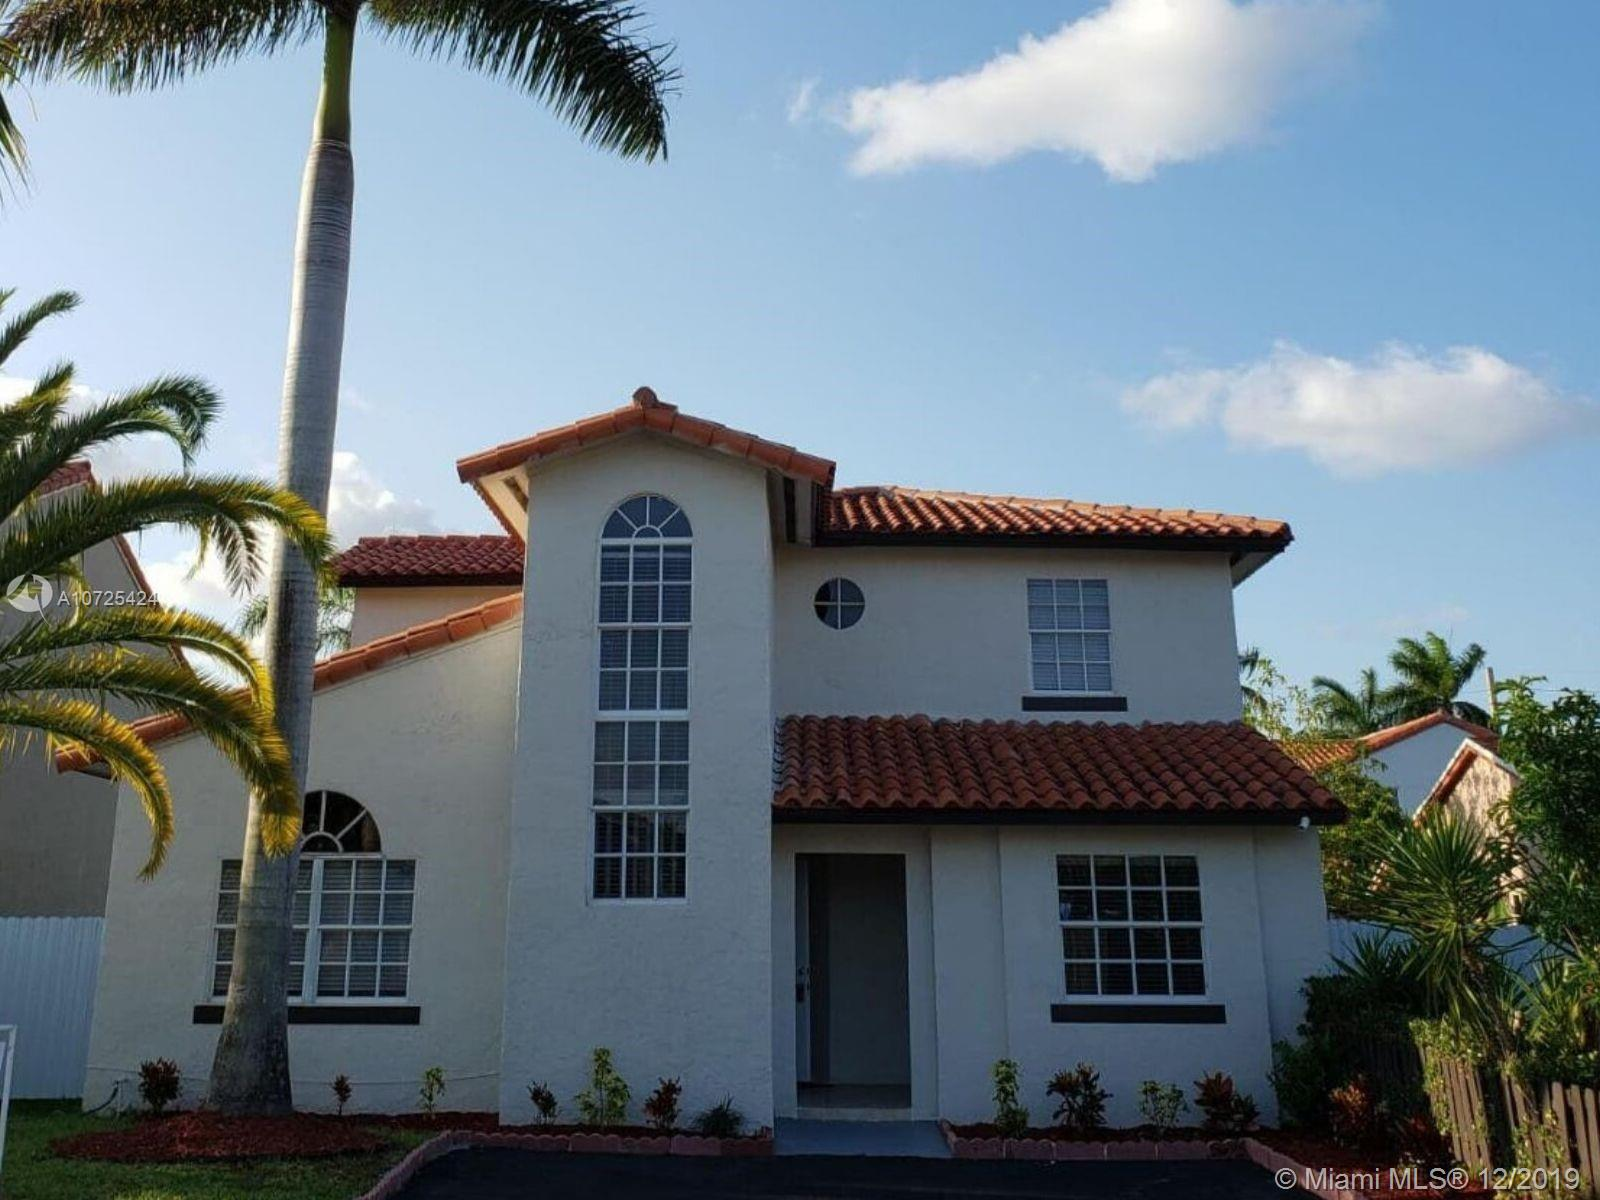 12309 250th St, Homestead, FL 33032 - Homestead, FL real estate listing